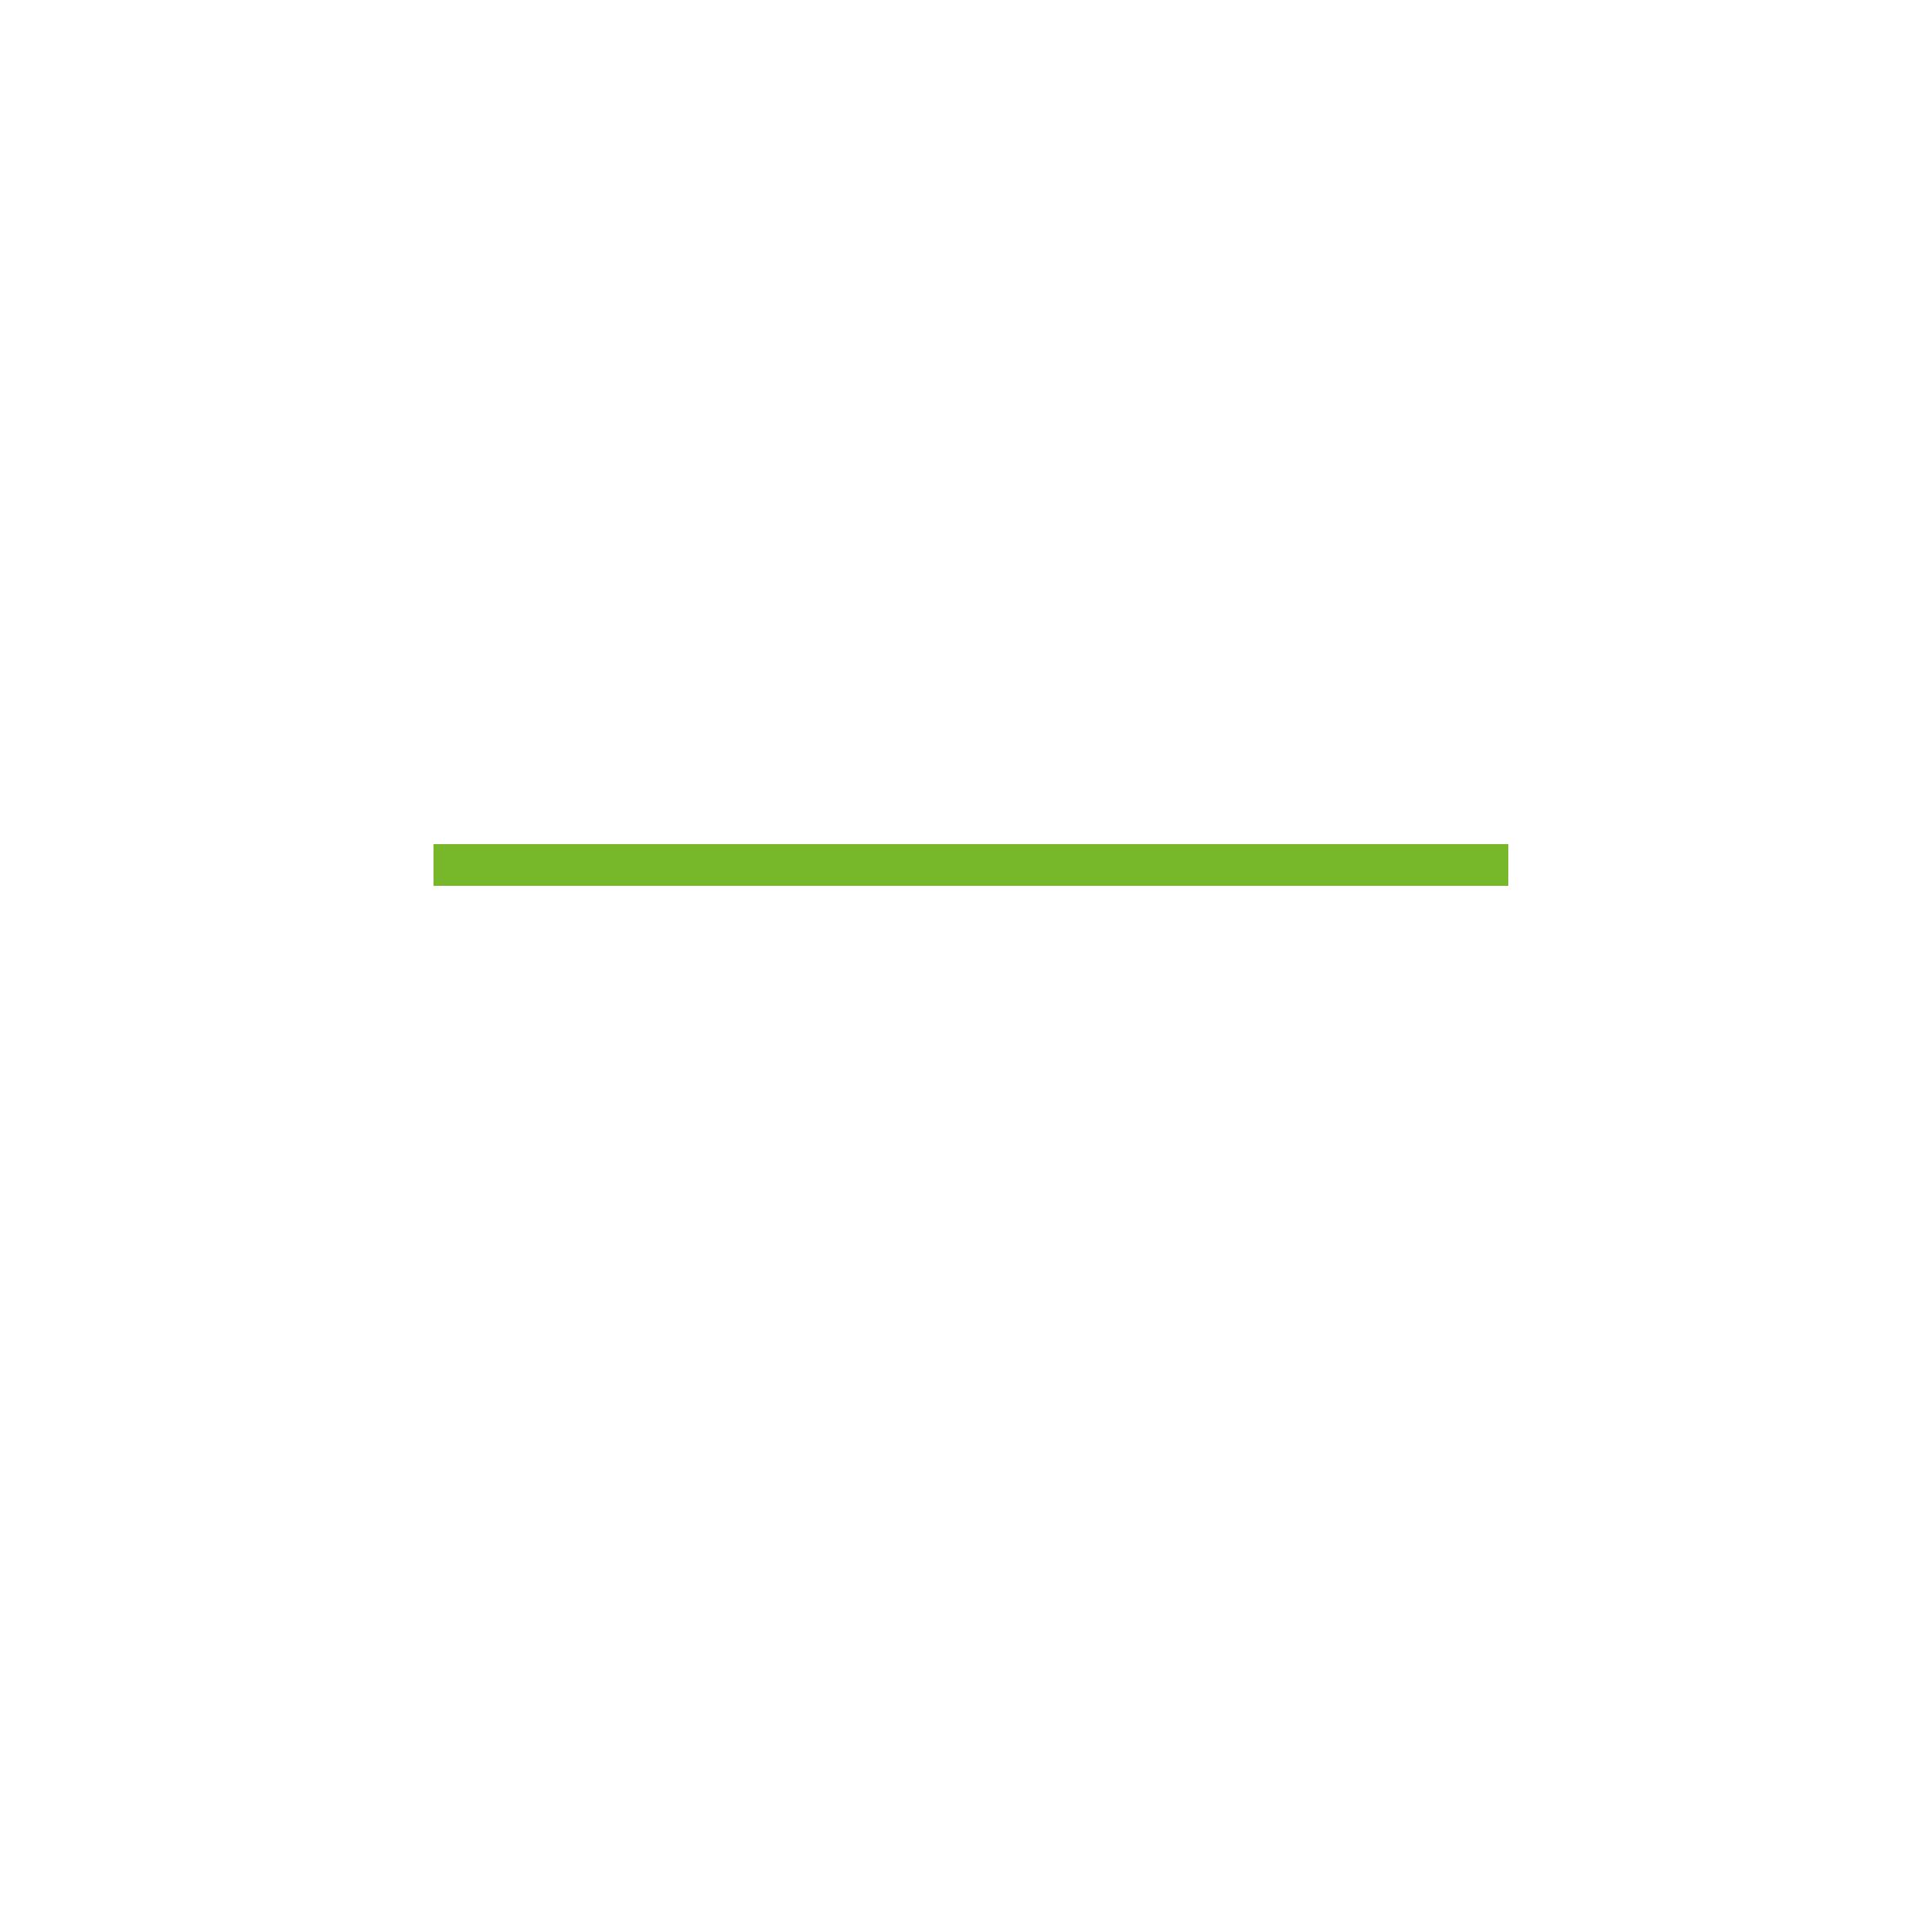 pleca verde.png